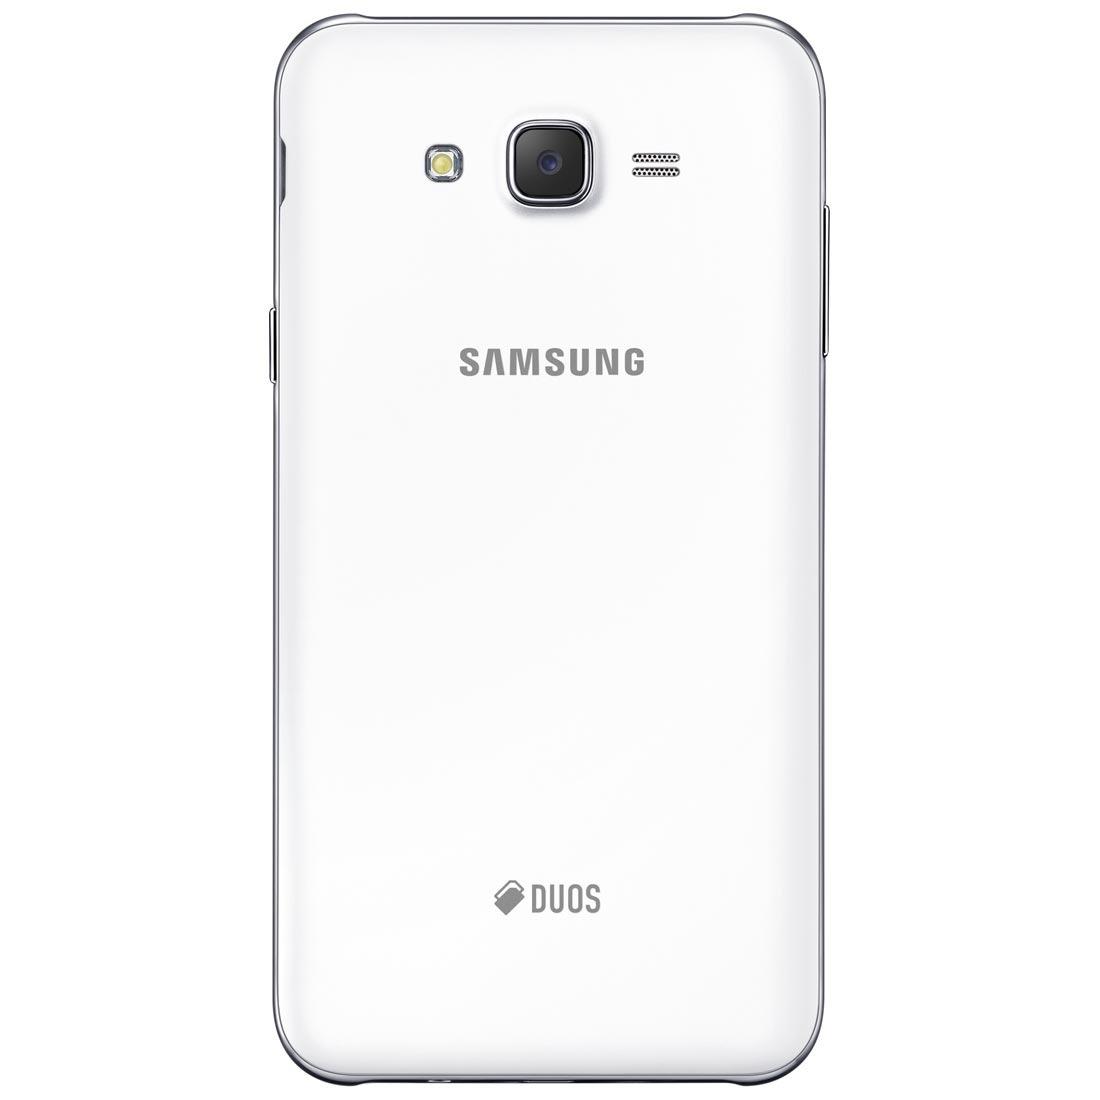 Smartphone Samsung Galaxy J7 Duos J700m Branco, 1.5ghz